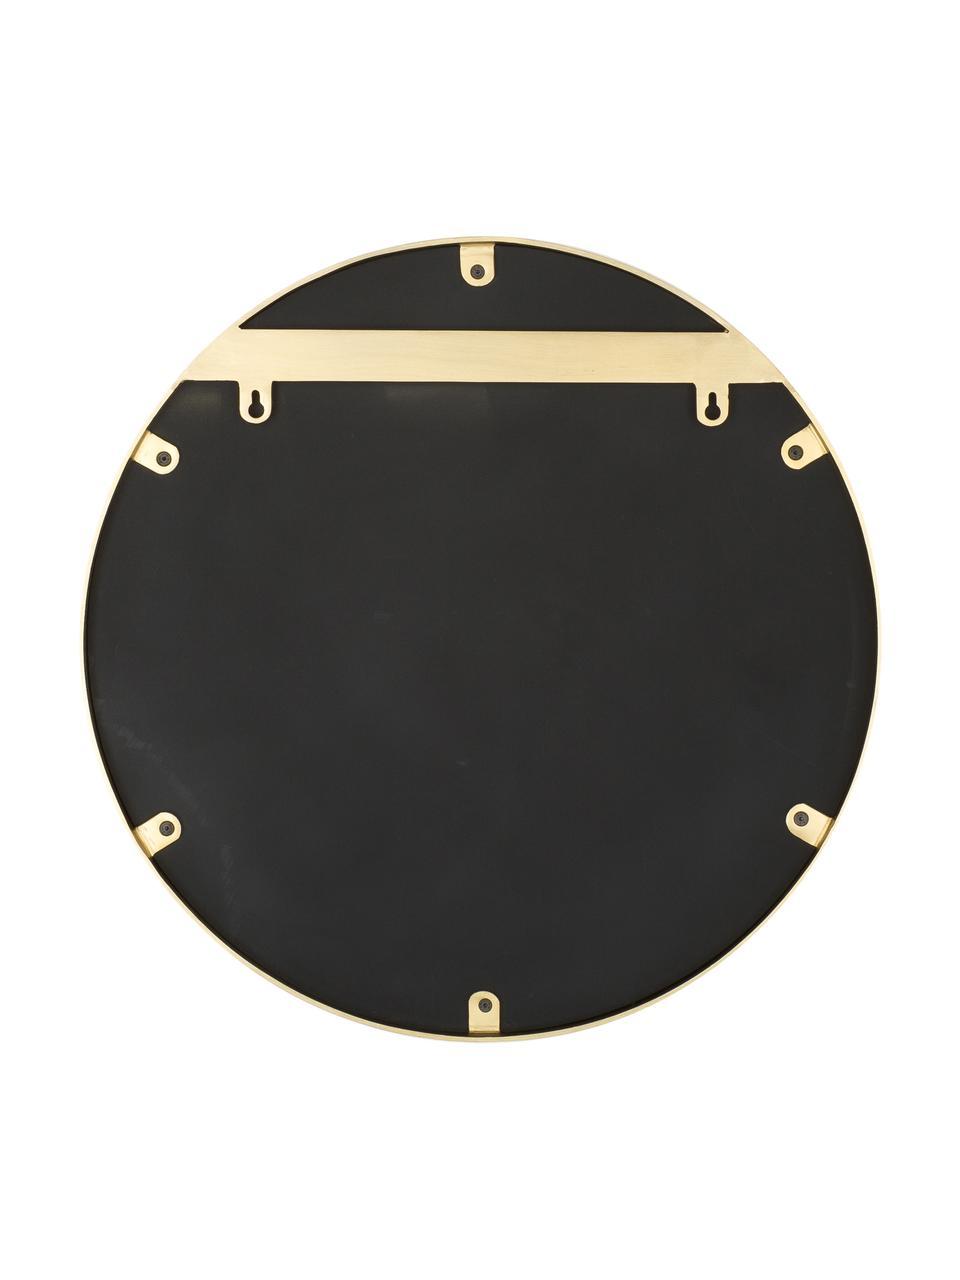 Espejo de pared redondo Ada, Espejo: cristal, Latón cepillado, Ø 120 cm